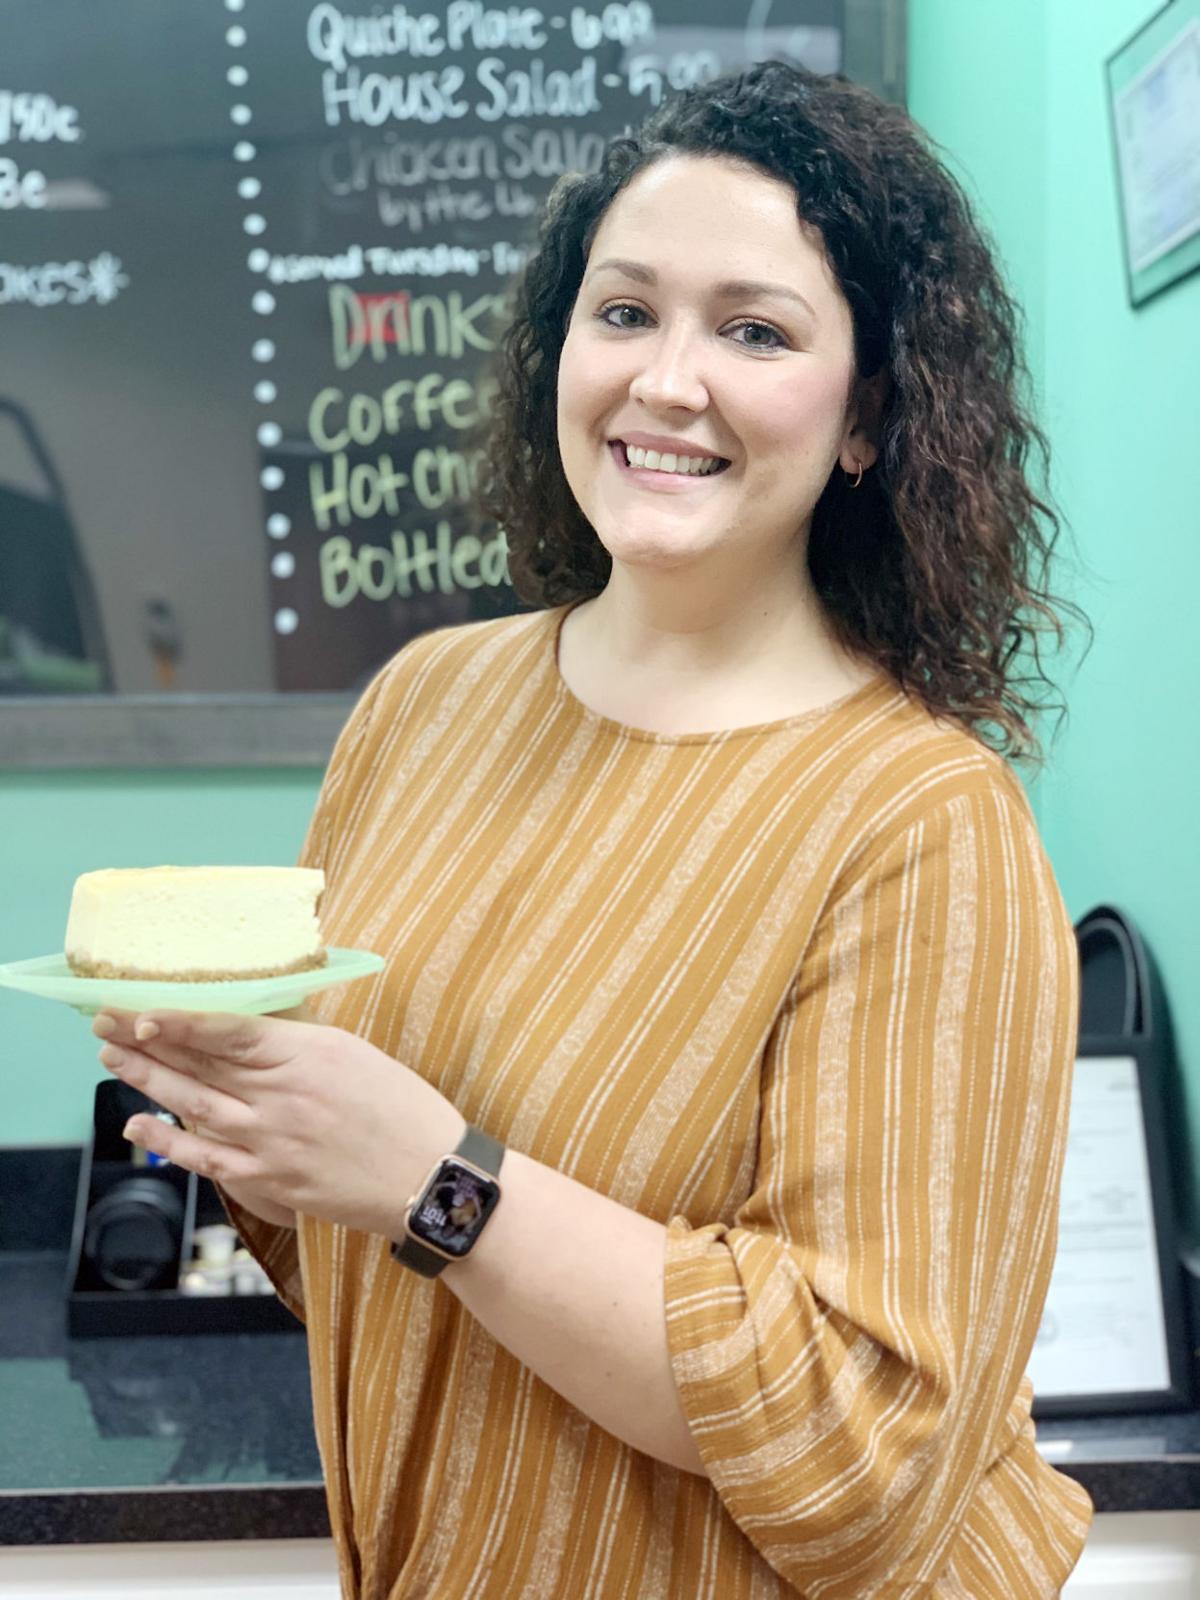 cheese cake owner adjusted.jpg